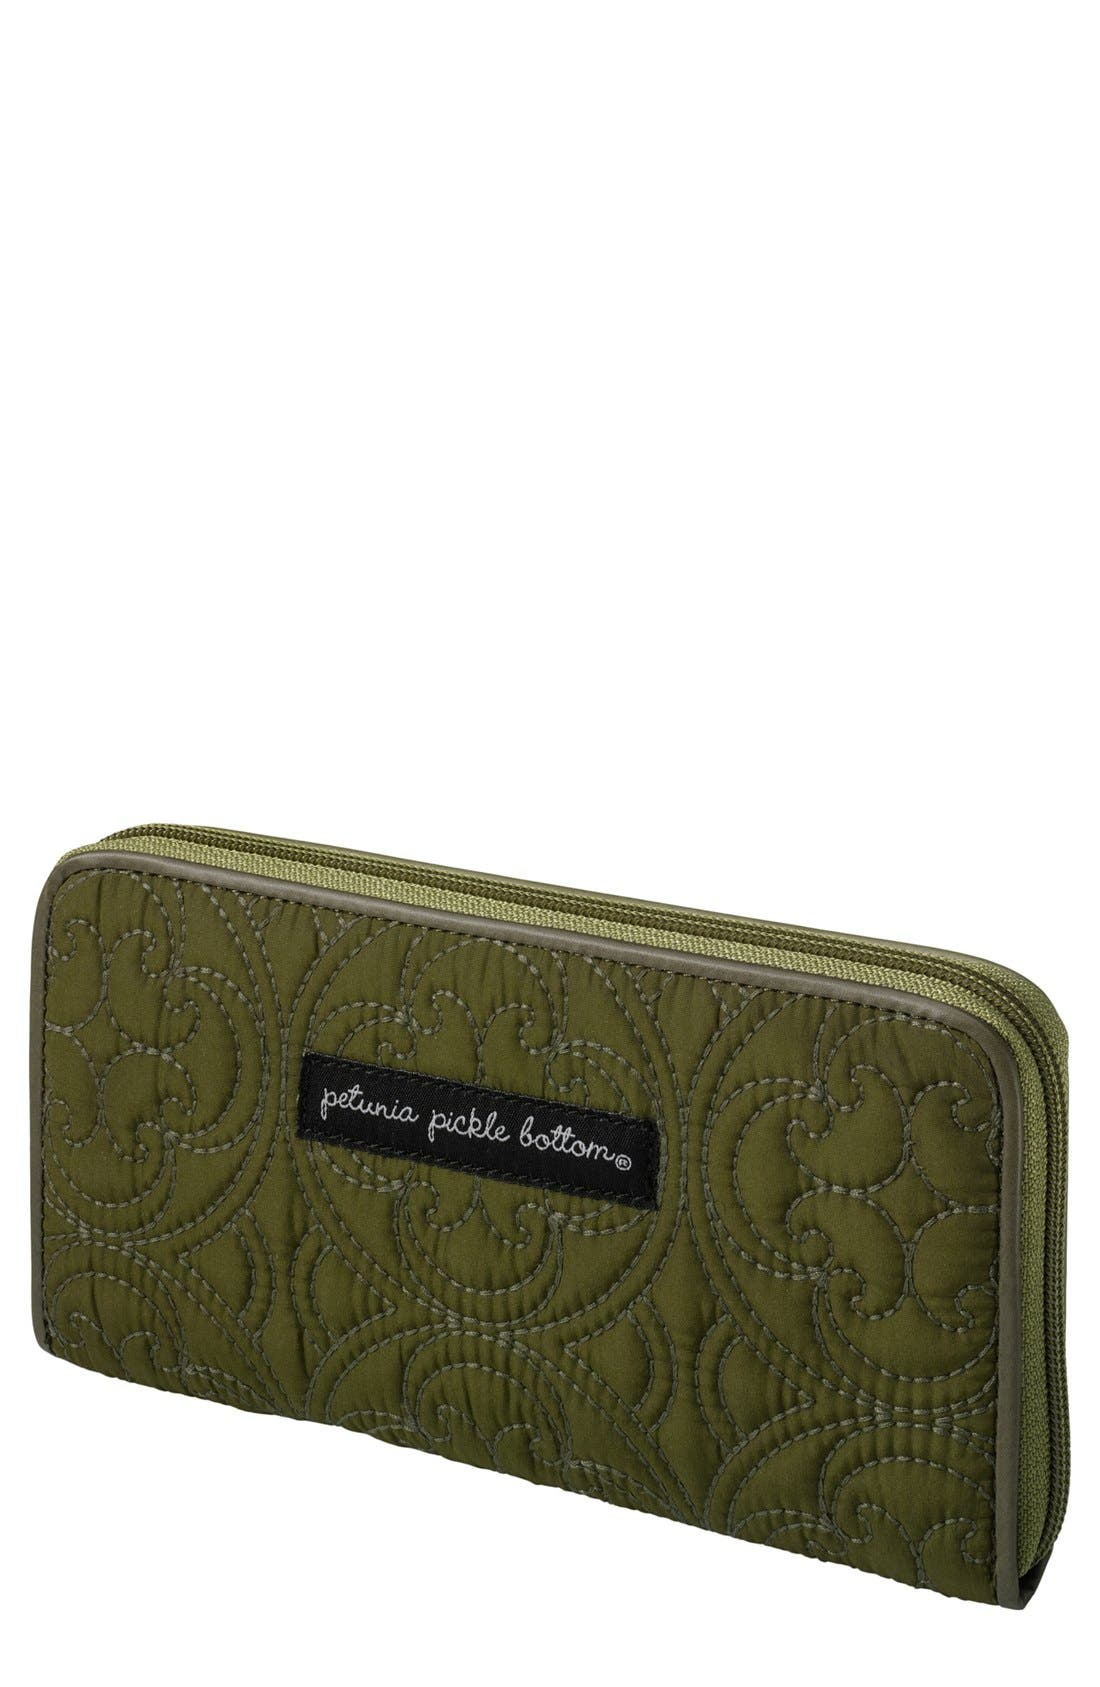 Main Image - Petunia Pickle Bottom 'Wanderlust' Wallet